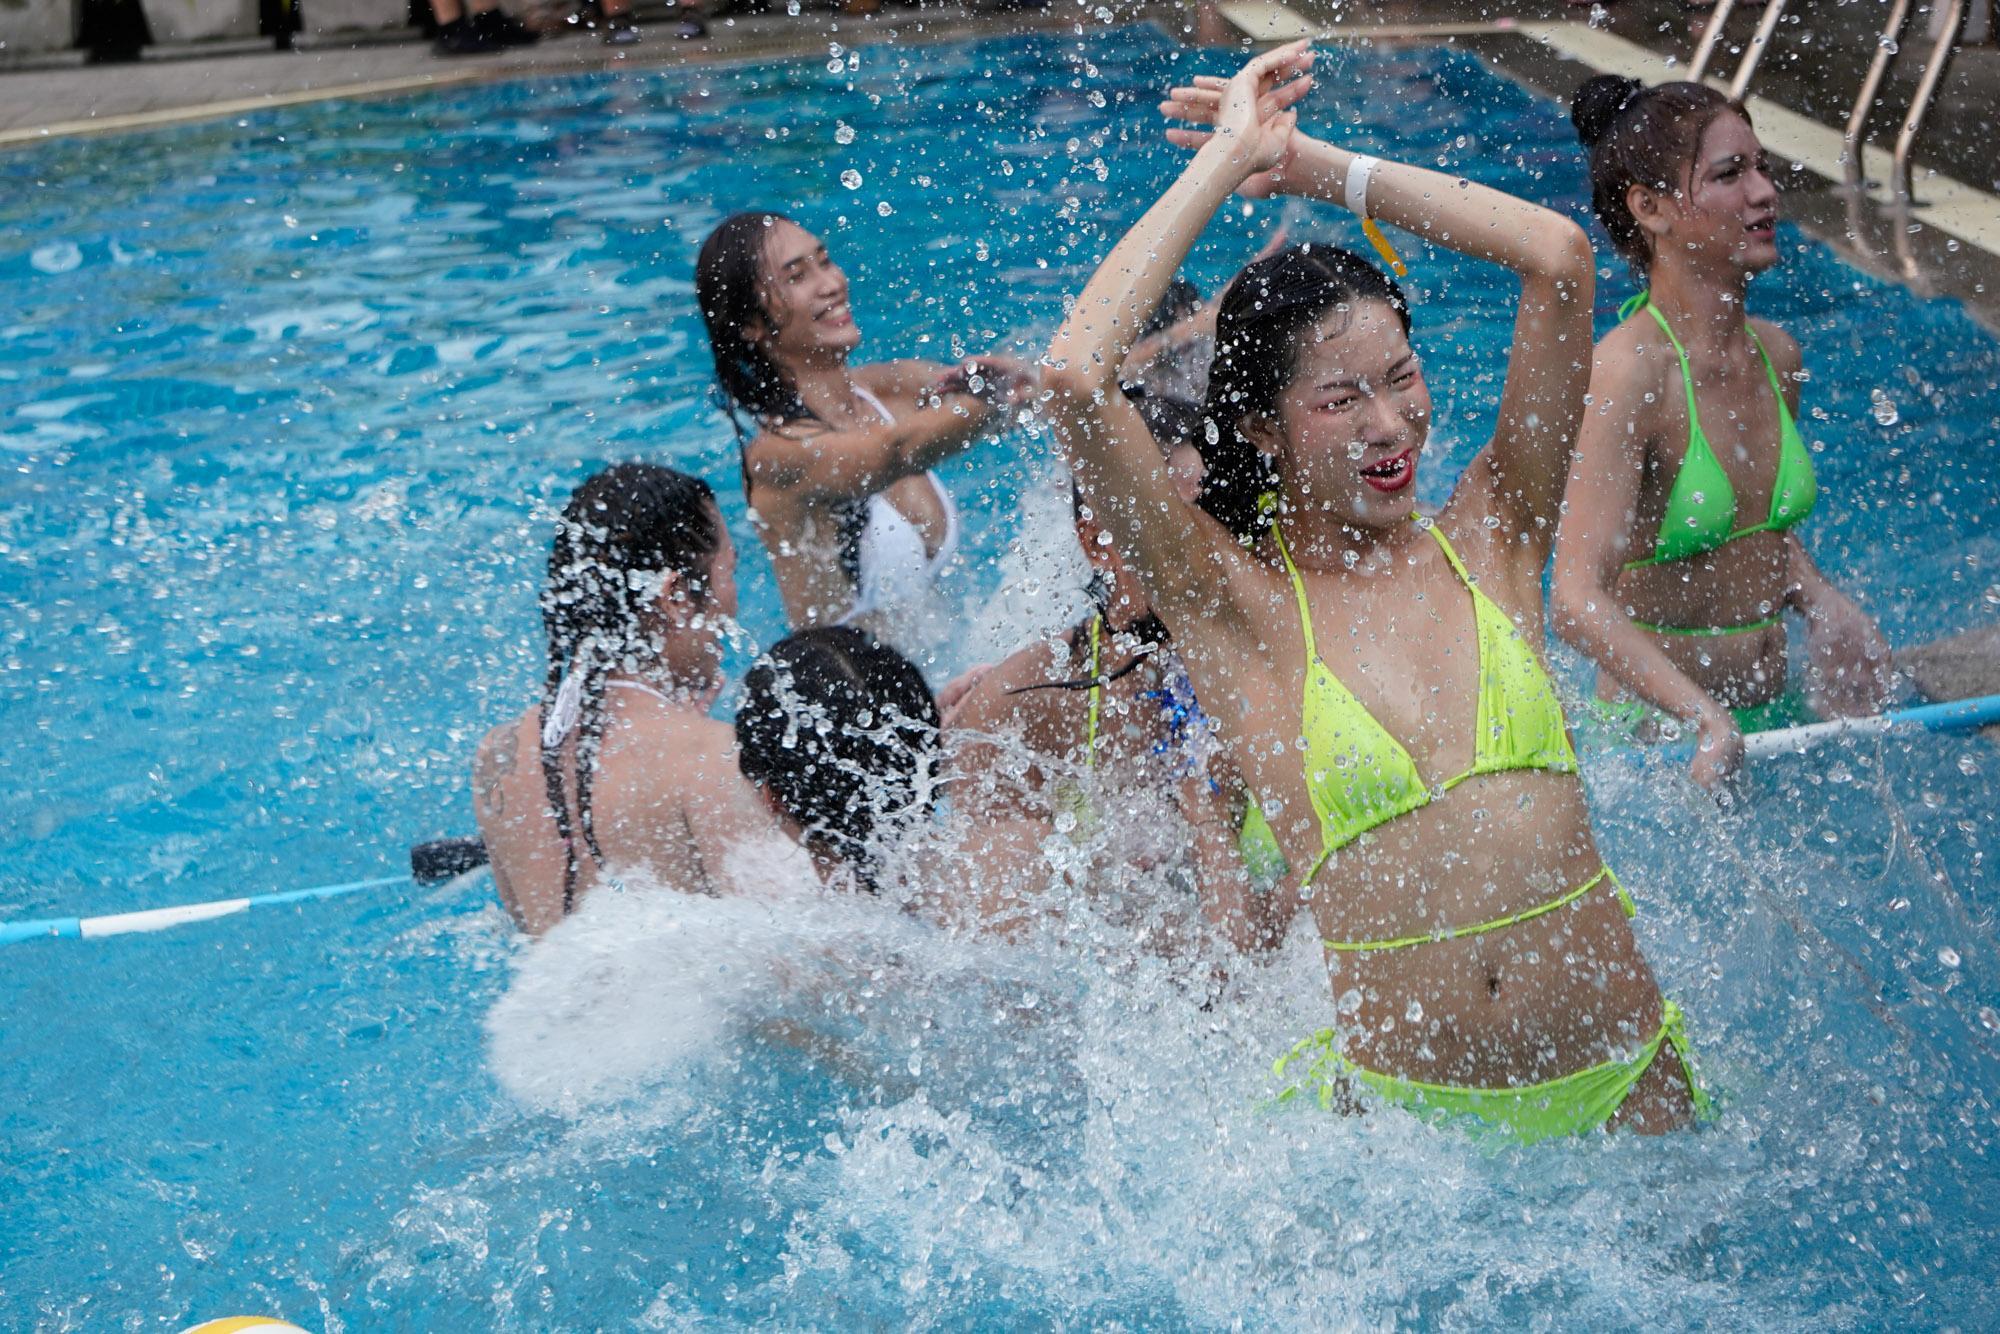 Ladyboy Water Volleyball